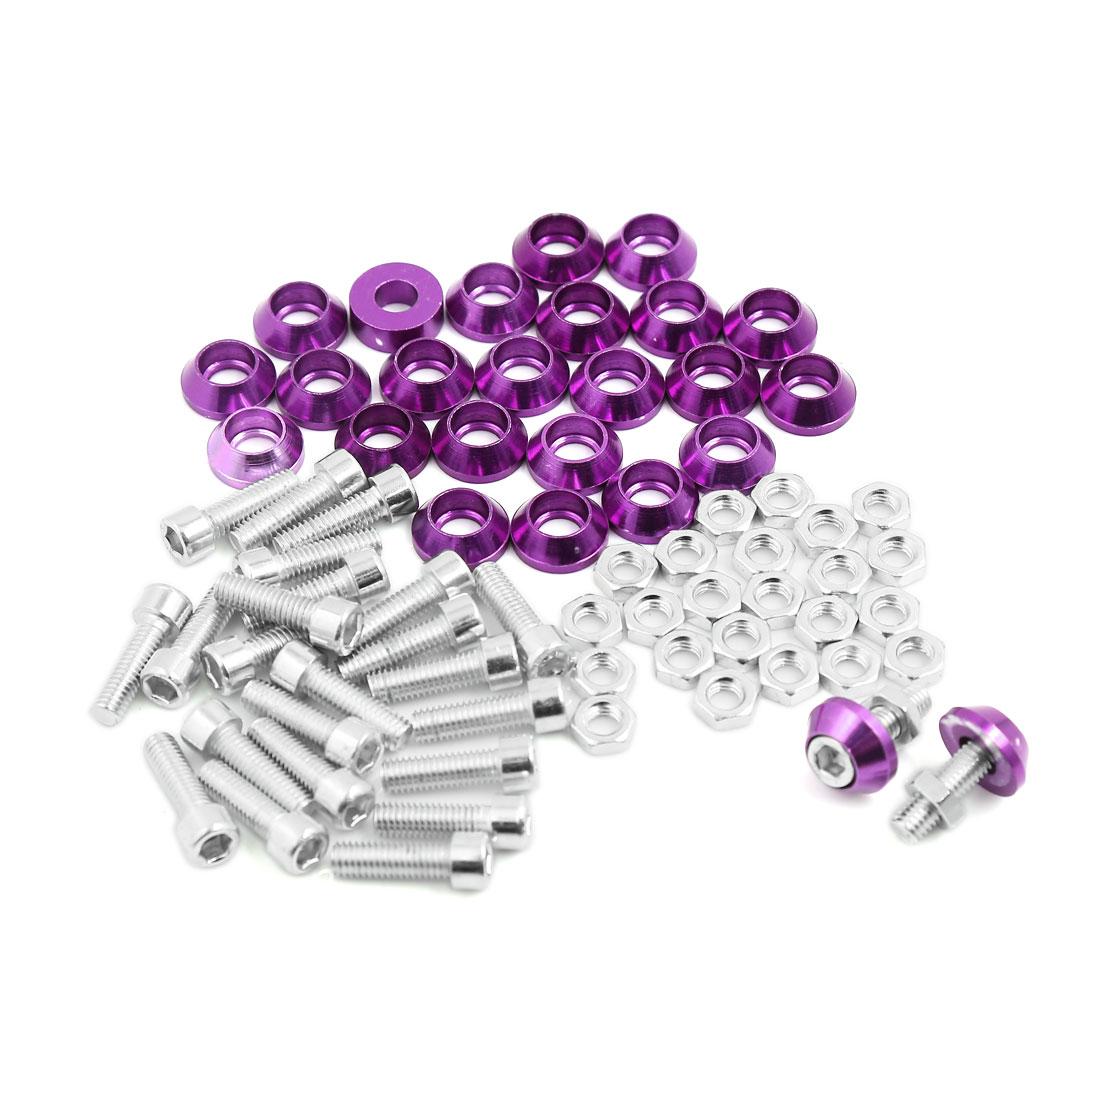 M6 Purple Metal Cone Head License Plate Frame Bolts Screws Nuts Decor 25pcs